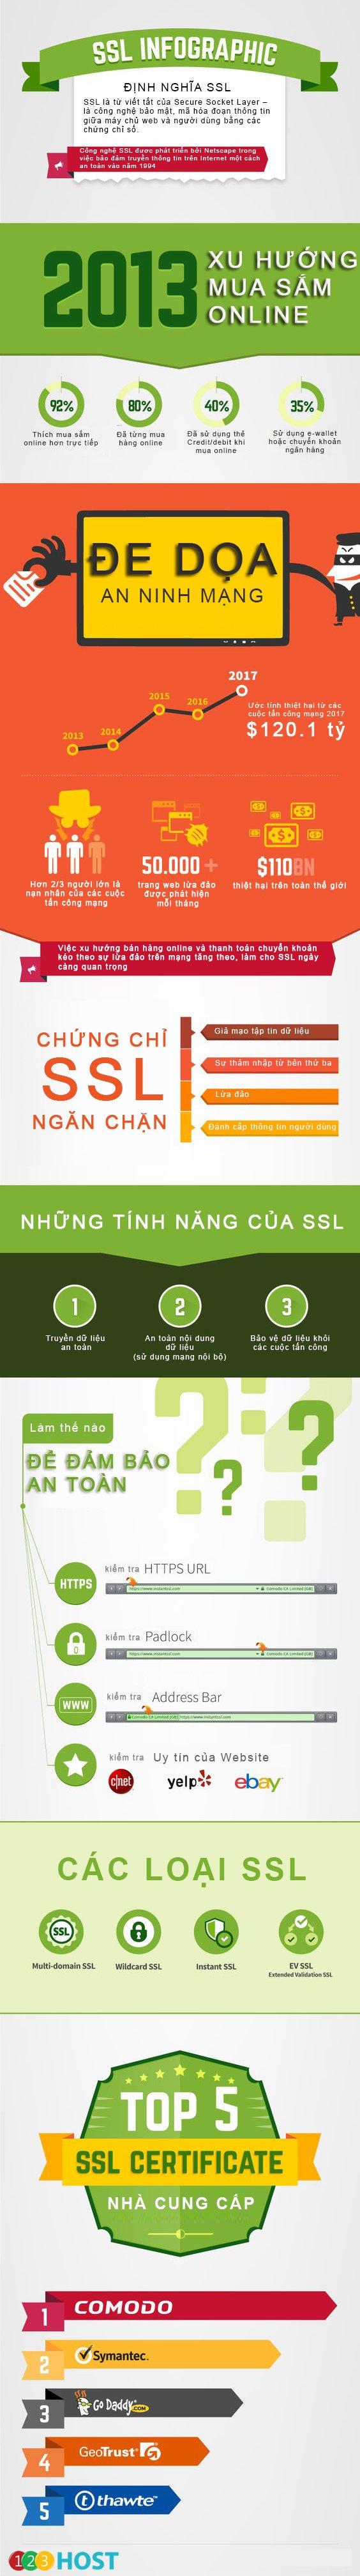 123Host_Mar_Chien_SSL là gì